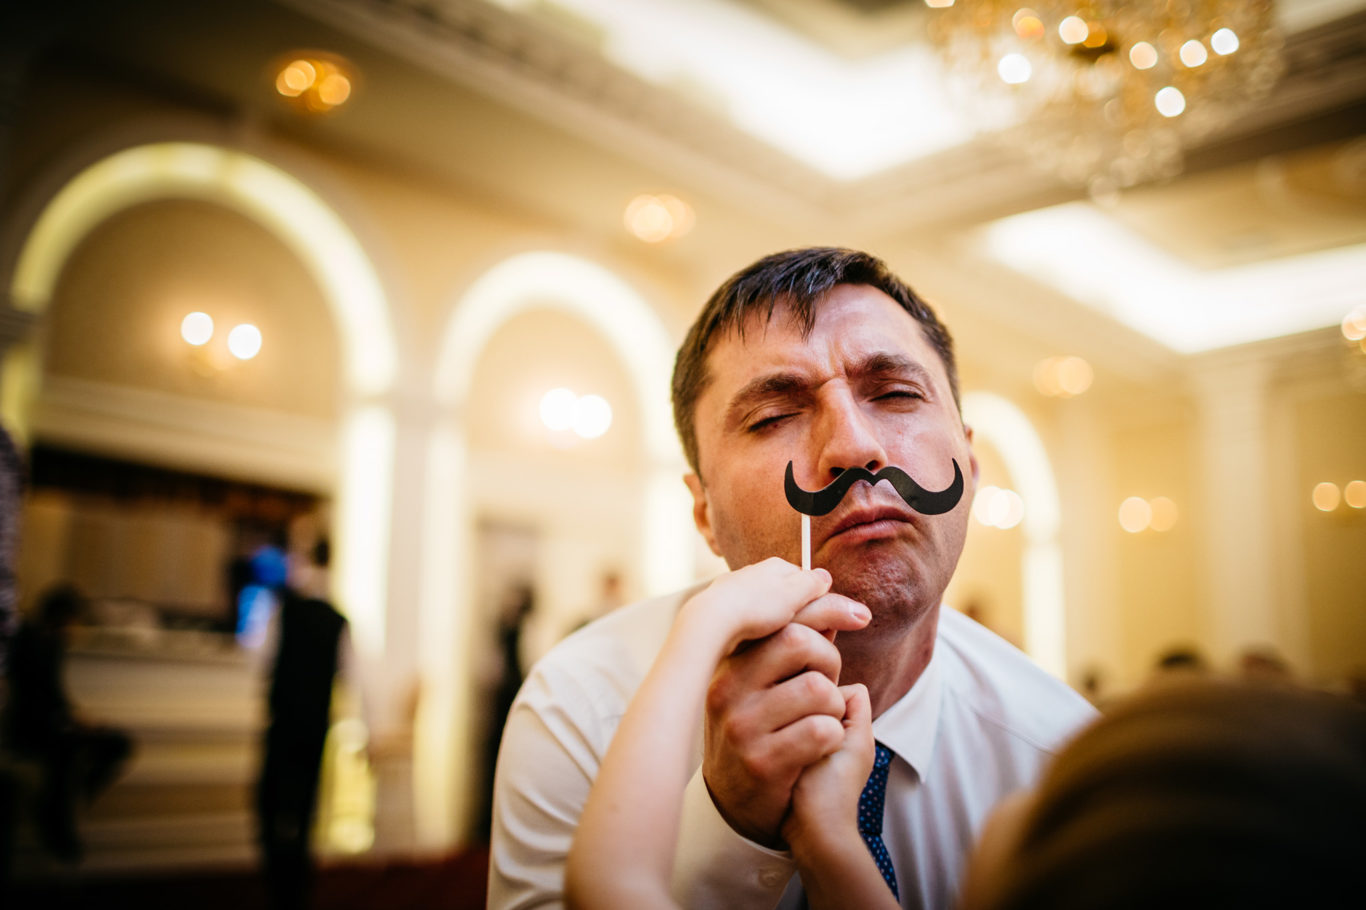 0657-fotografie-nunta-bucuresti-anca-george-fotograf-ciprian-dumitrescu-dcf_5848